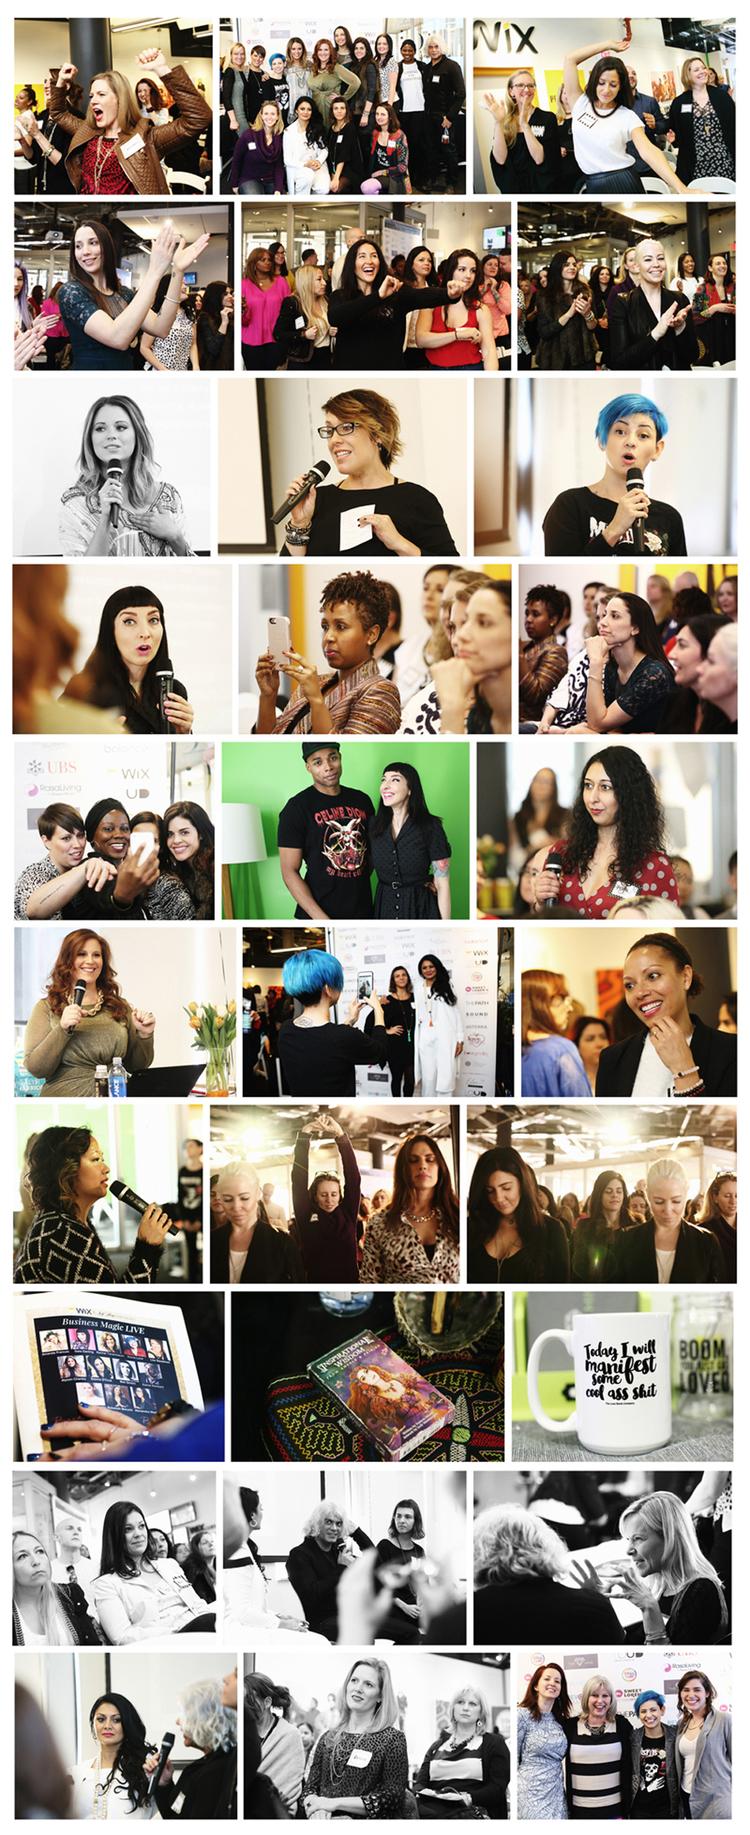 businessmagiclive nyc monika broz amazing speakers included kimra luna amanda s rachel tenenbaum the self help socialite lisa steadman gala darling alyson charles donna d cruz